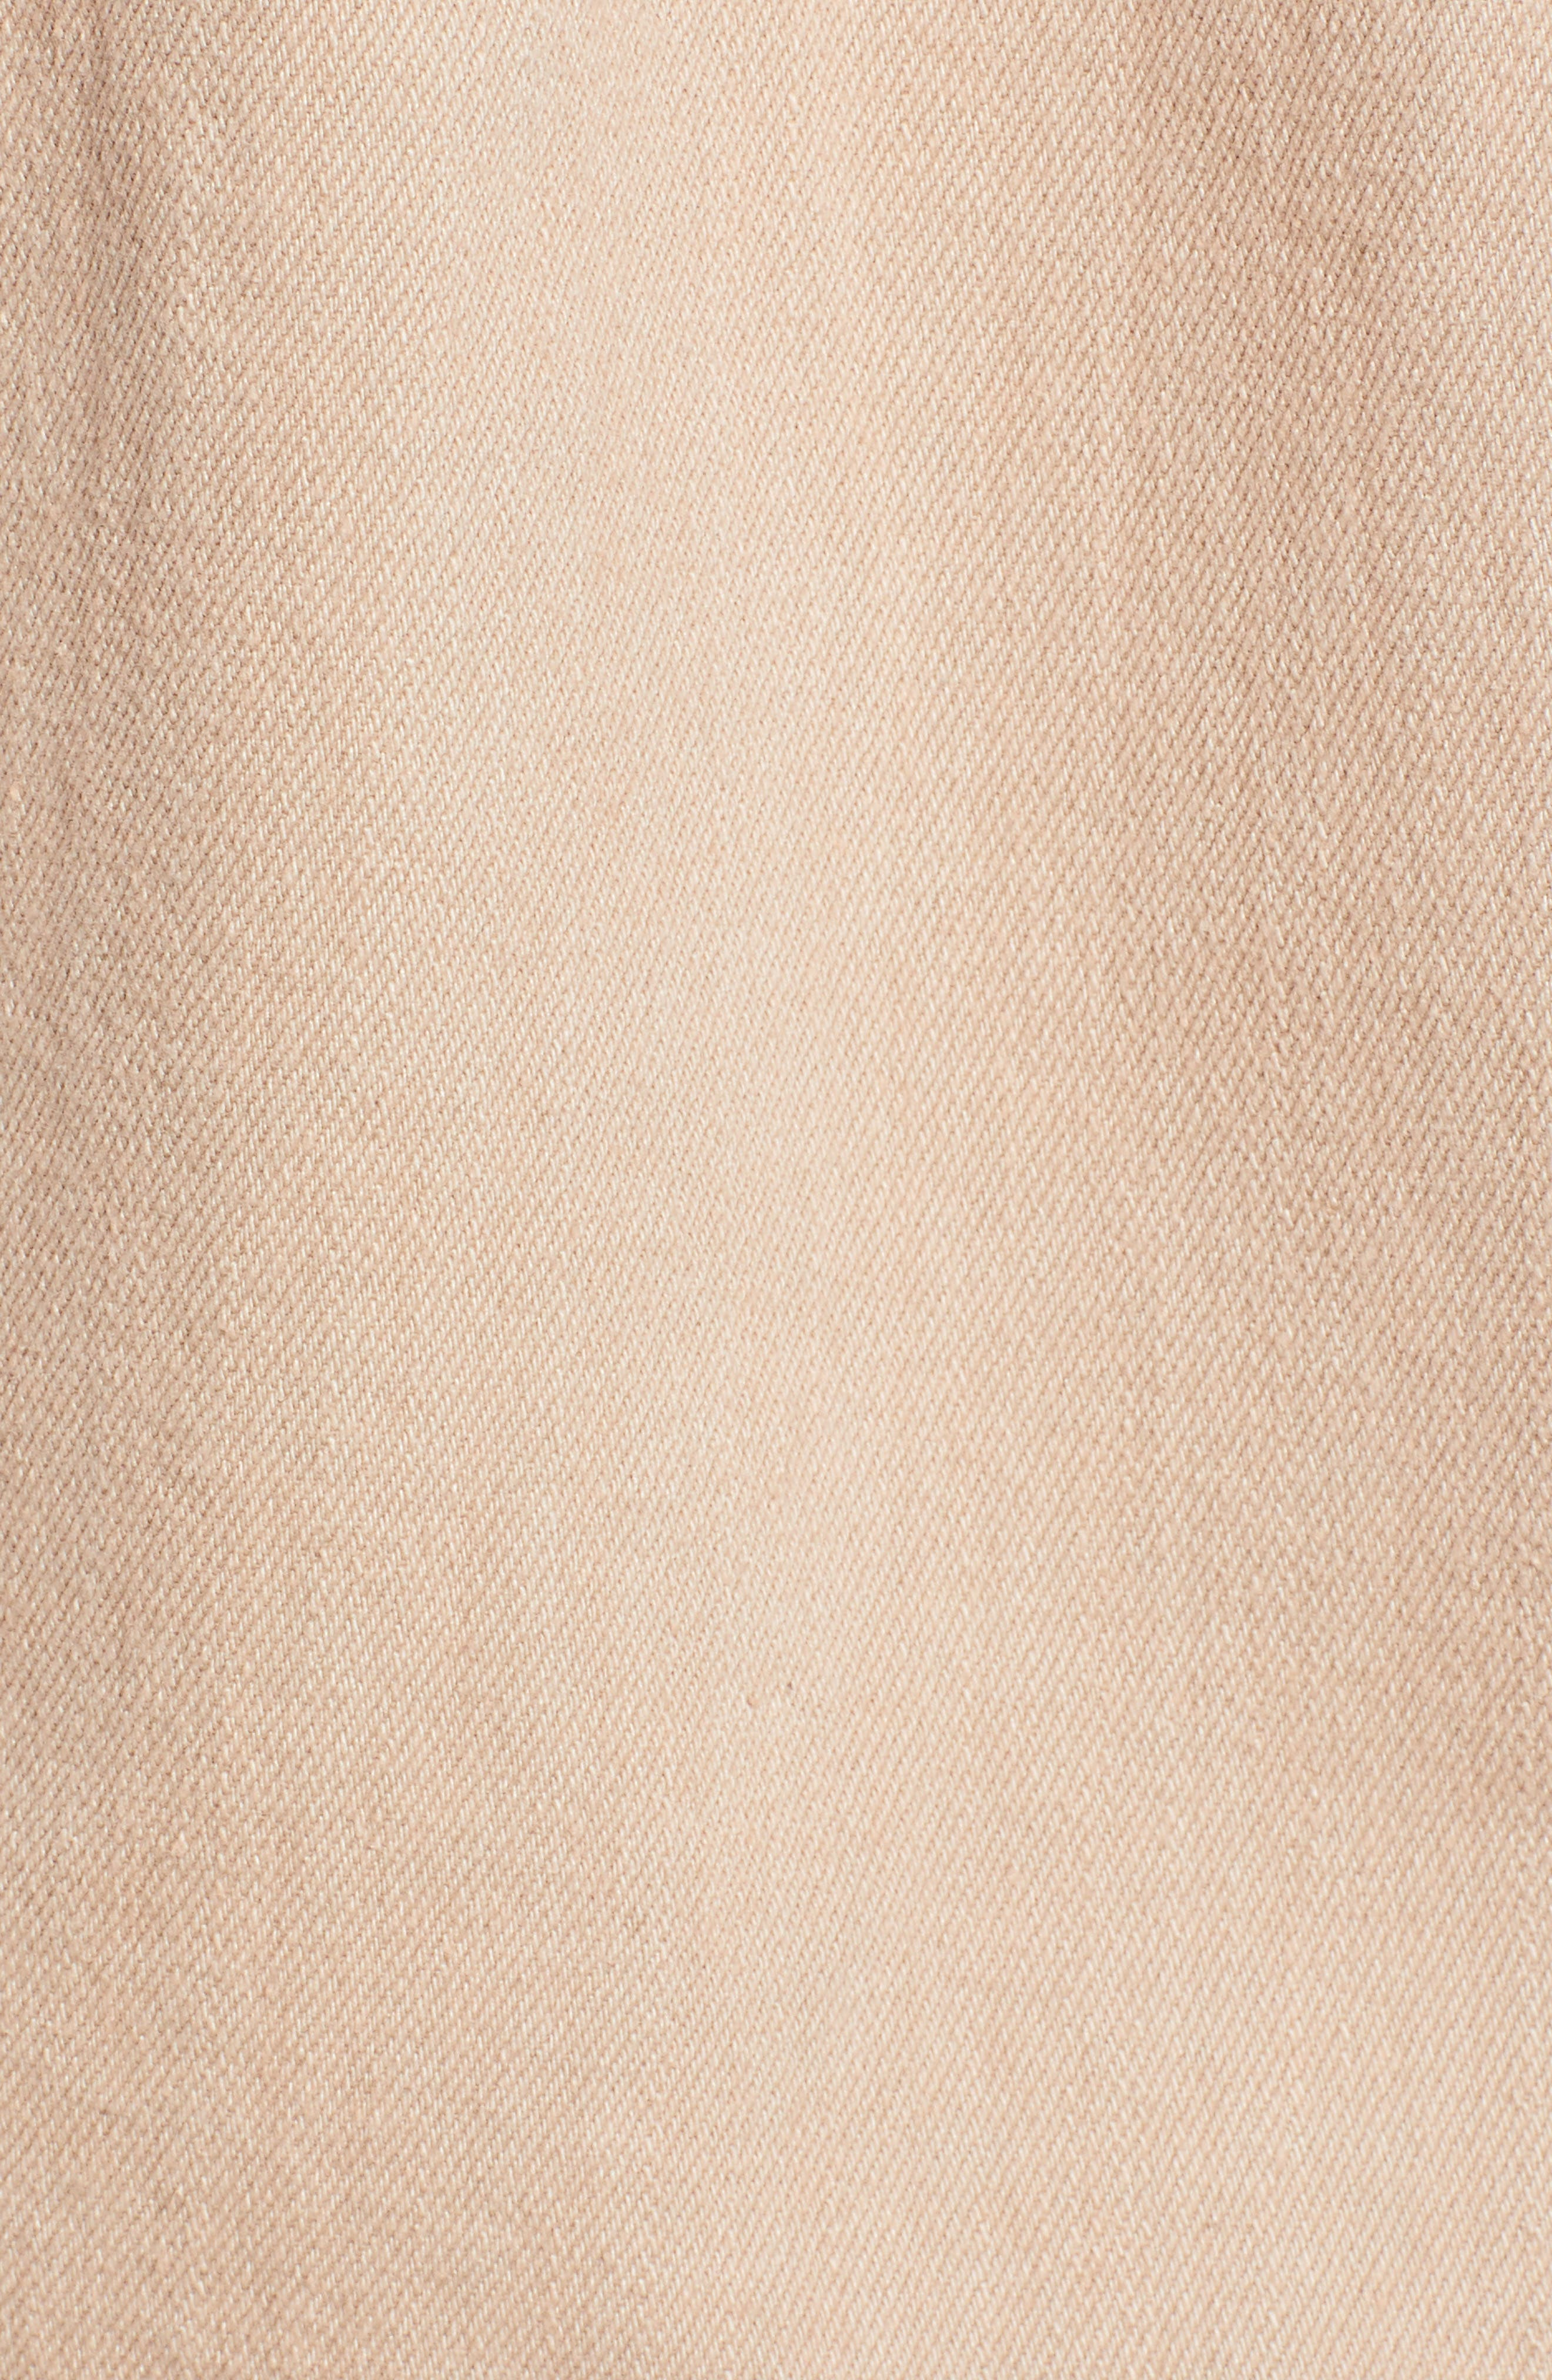 Claudia Oversize Denim Jacket,                             Alternate thumbnail 7, color,                             250